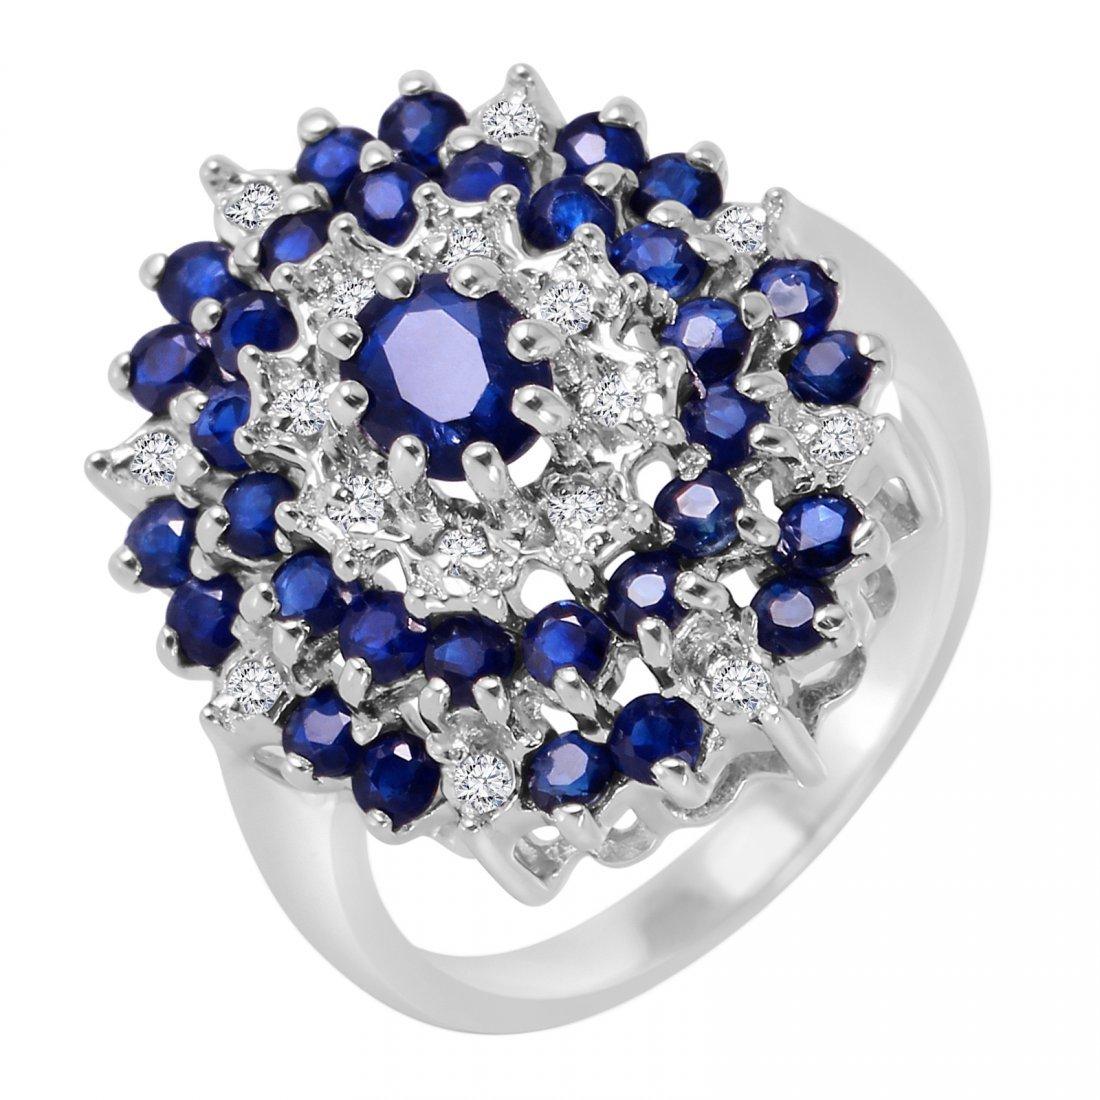 10K White Gold Sapphire Diamond Ring, 0.71 ctw